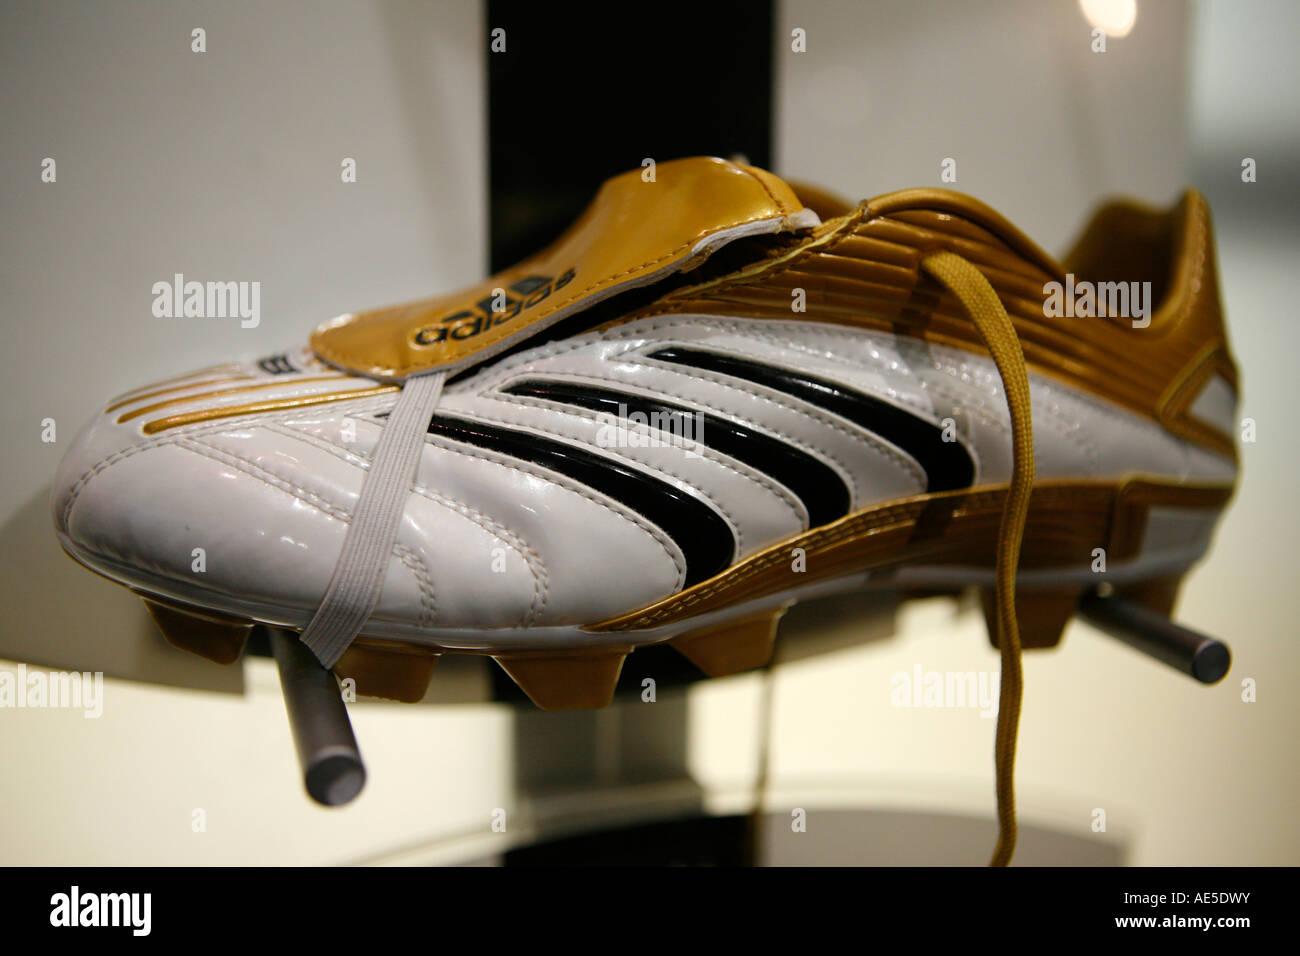 adidas head office germany